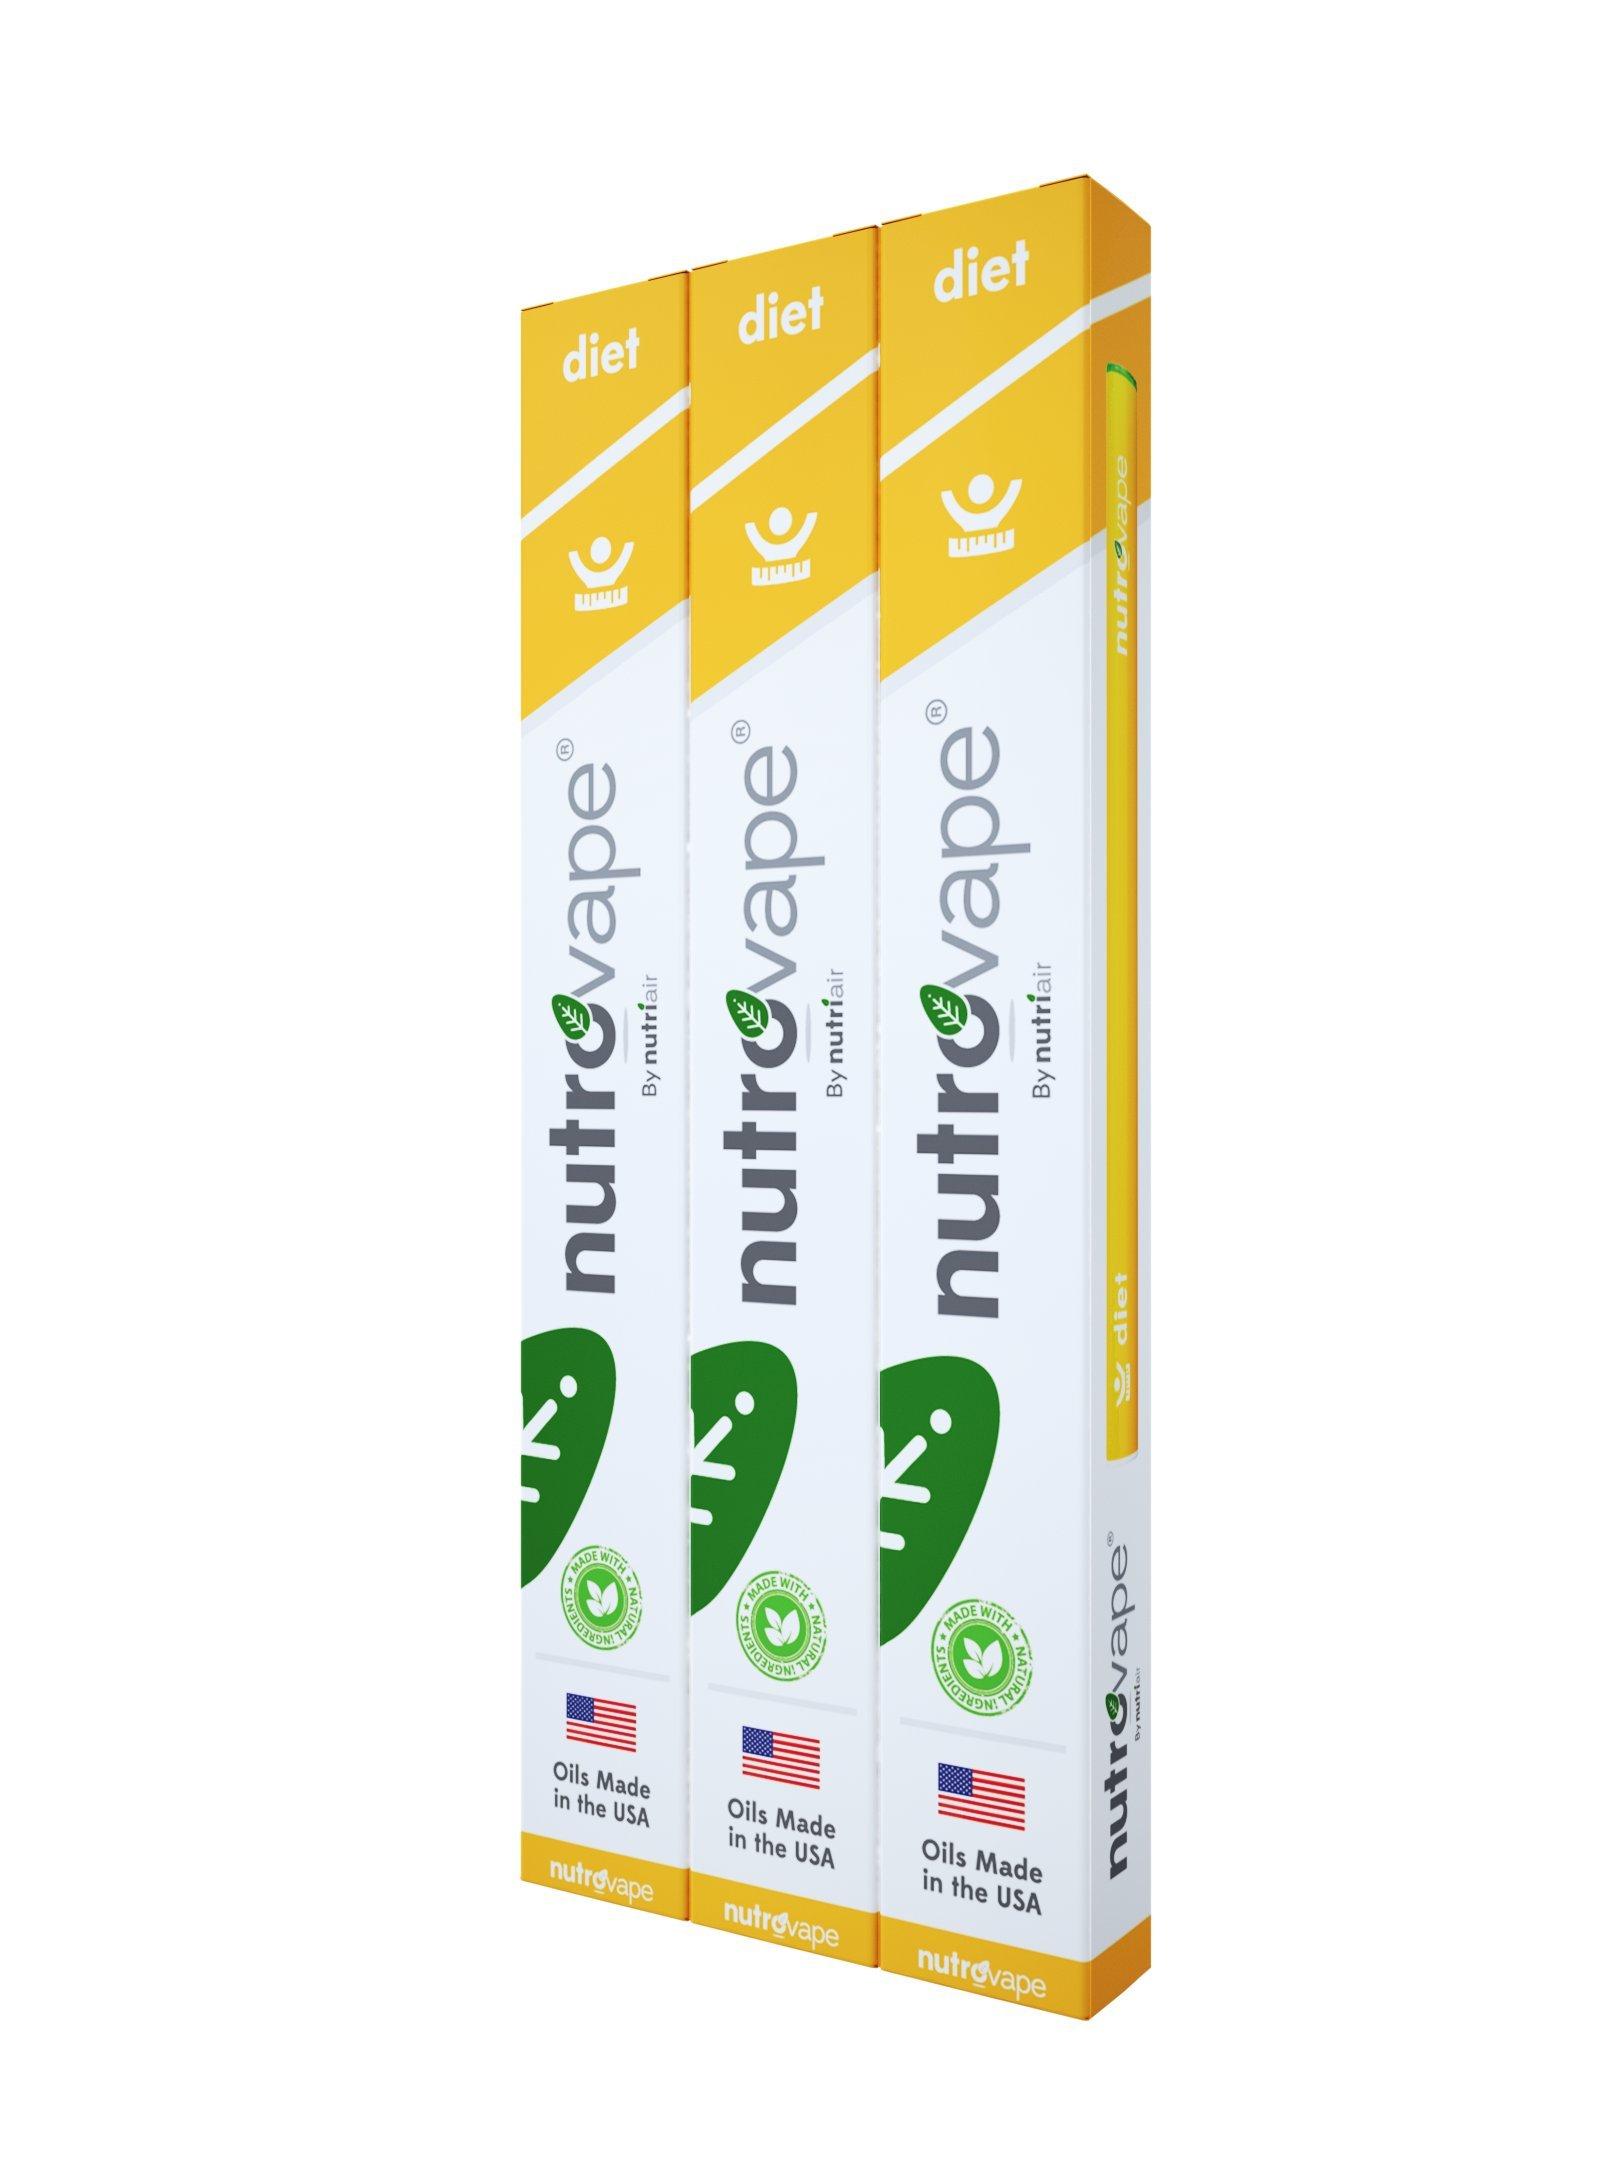 Nutrovape | World's 1st Diet Inhaler | Hunger Suppressant, Promotes Healthy Weight Loss | Diet Pill Alternative | All Natural Hoodia Gordonni, Garcinia Gambogia, Green Tea Extract (3)